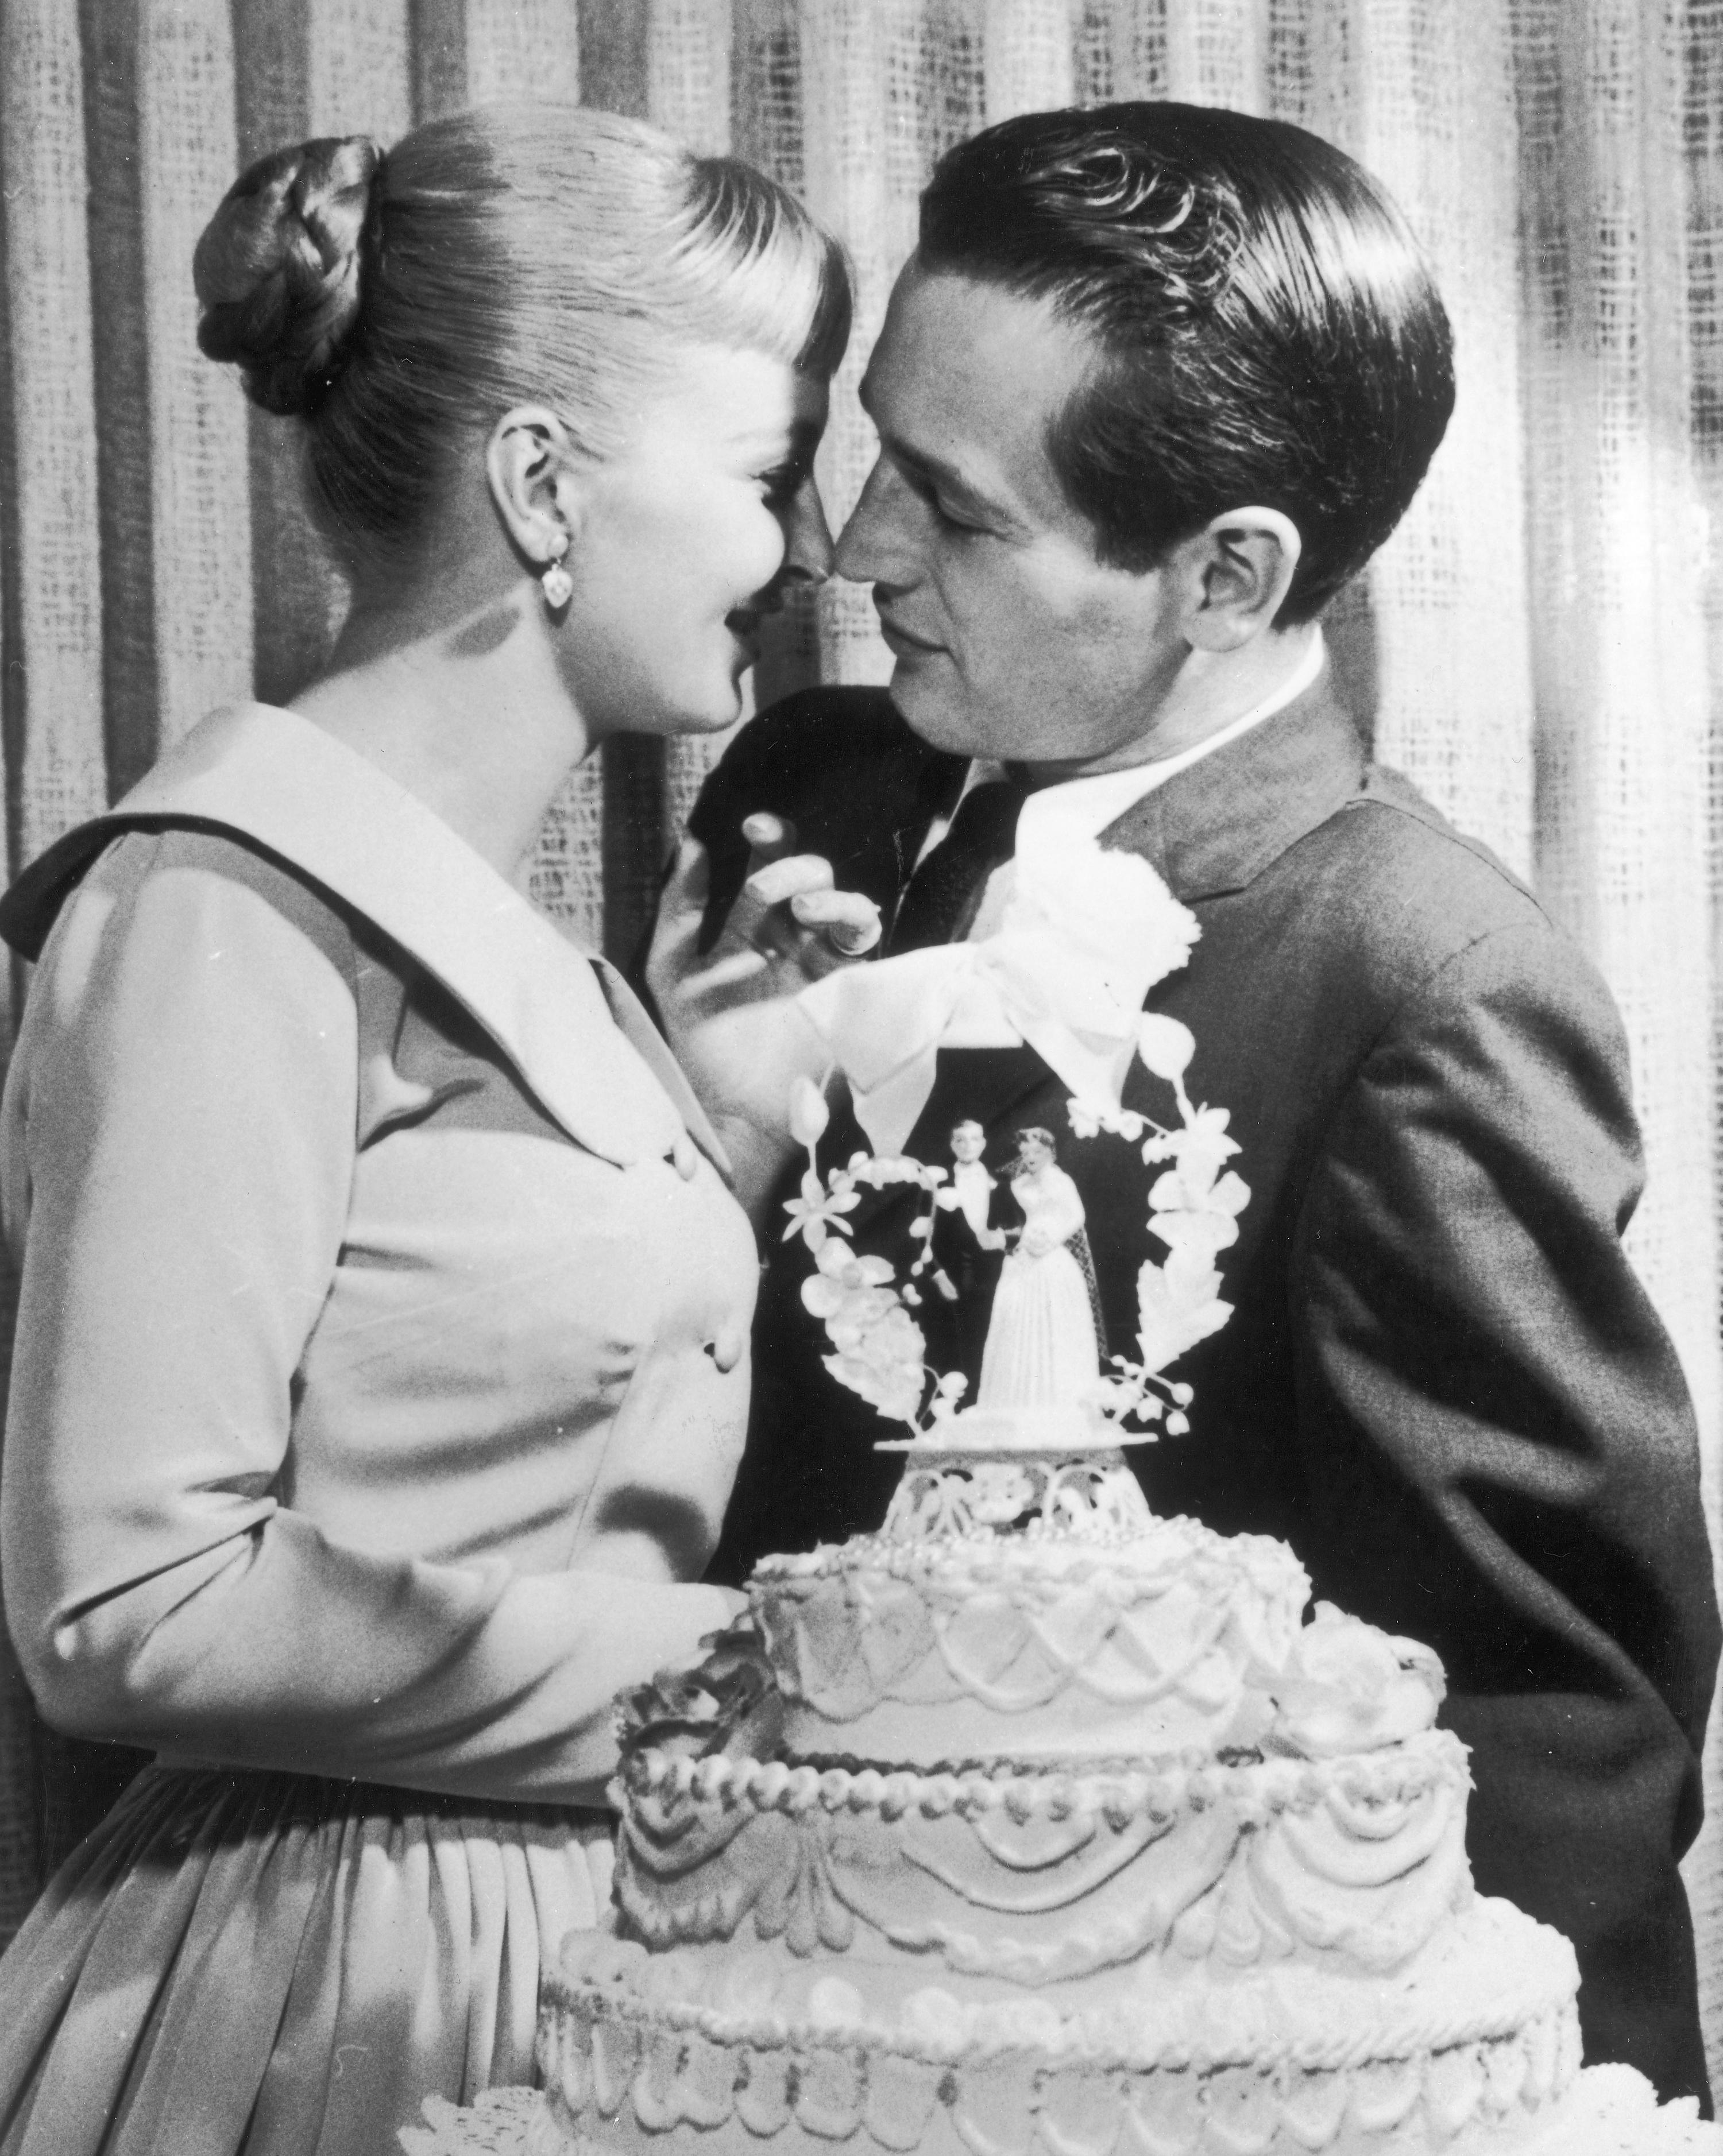 celebrity-vintage-wedding-cakes-paul-newman-joanne-woodward-1686495-1015.jpg